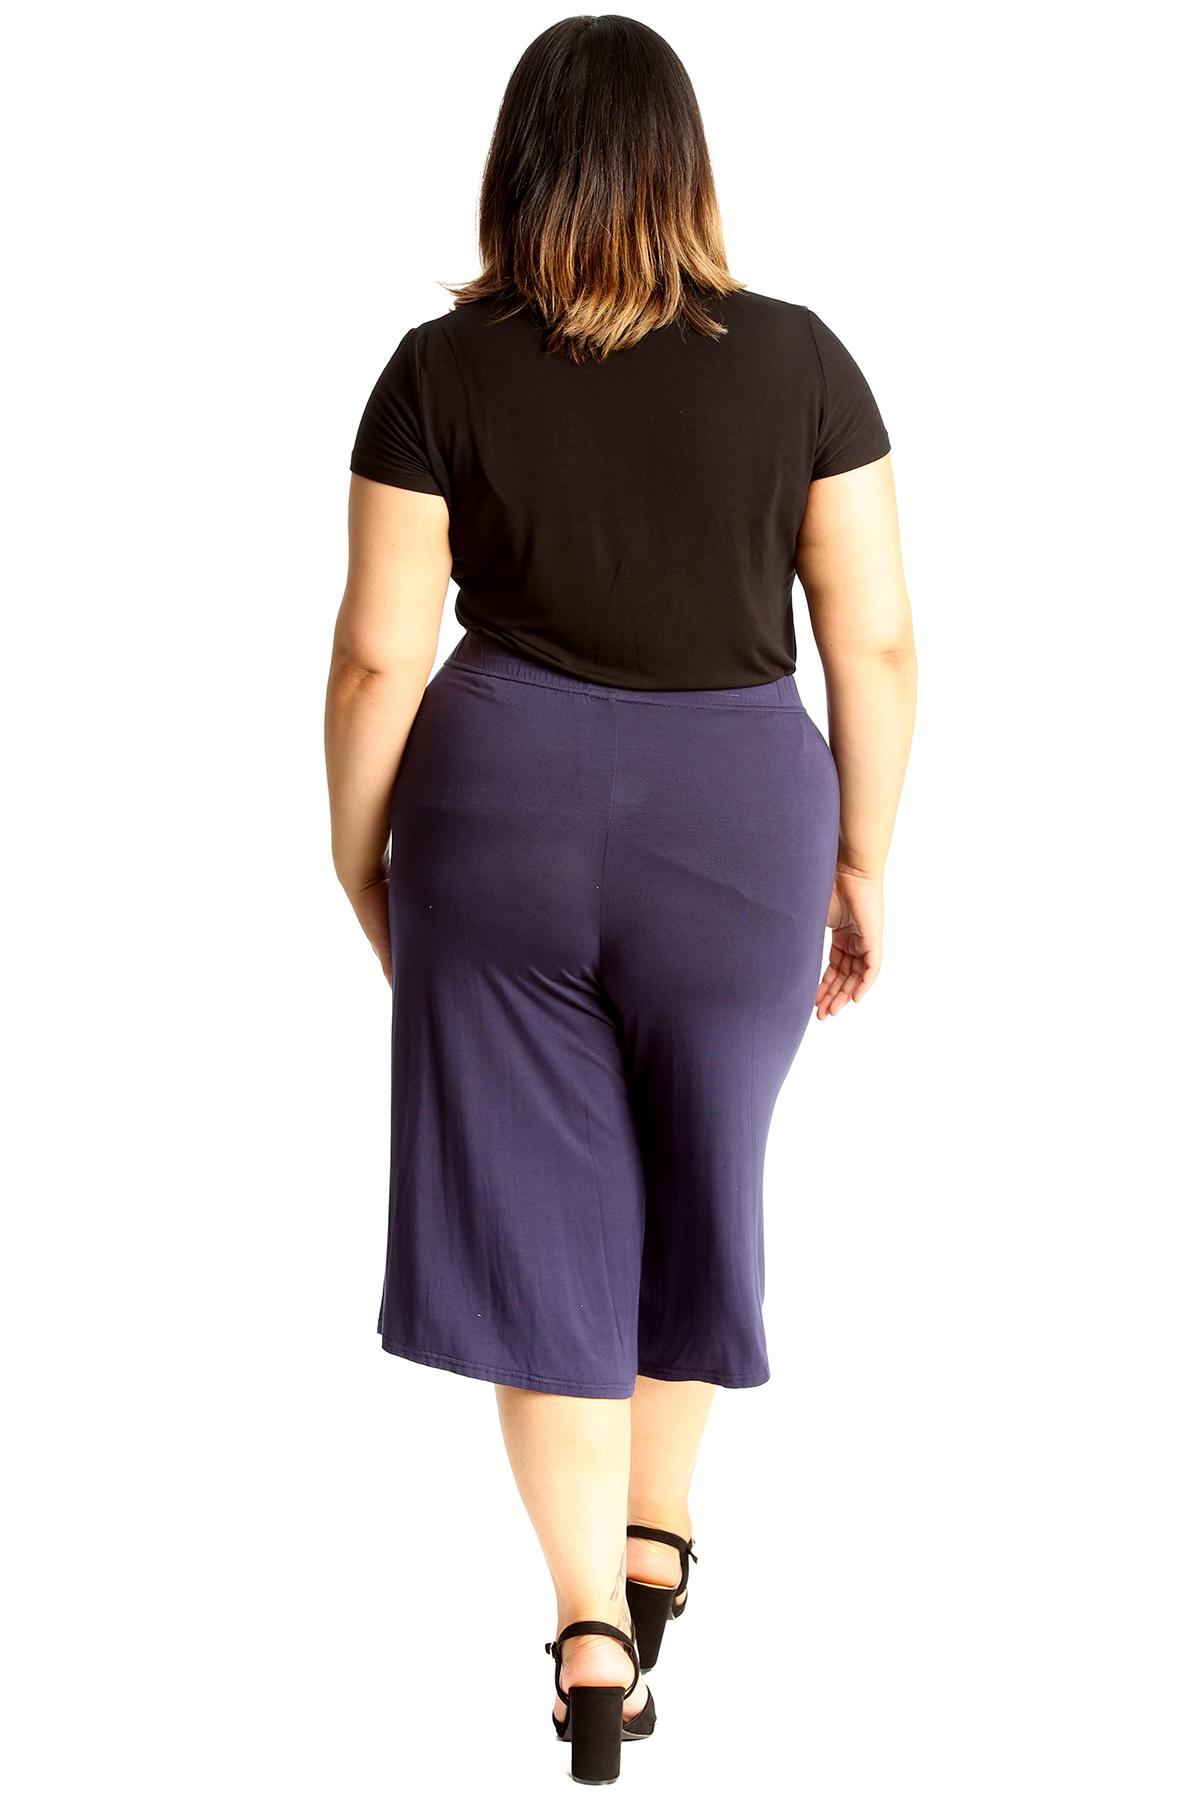 New-Womens-Plus-Size-Culottes-Ladies-Plain-Shorts-Palazzo-Elastic-Pants-Summer thumbnail 68